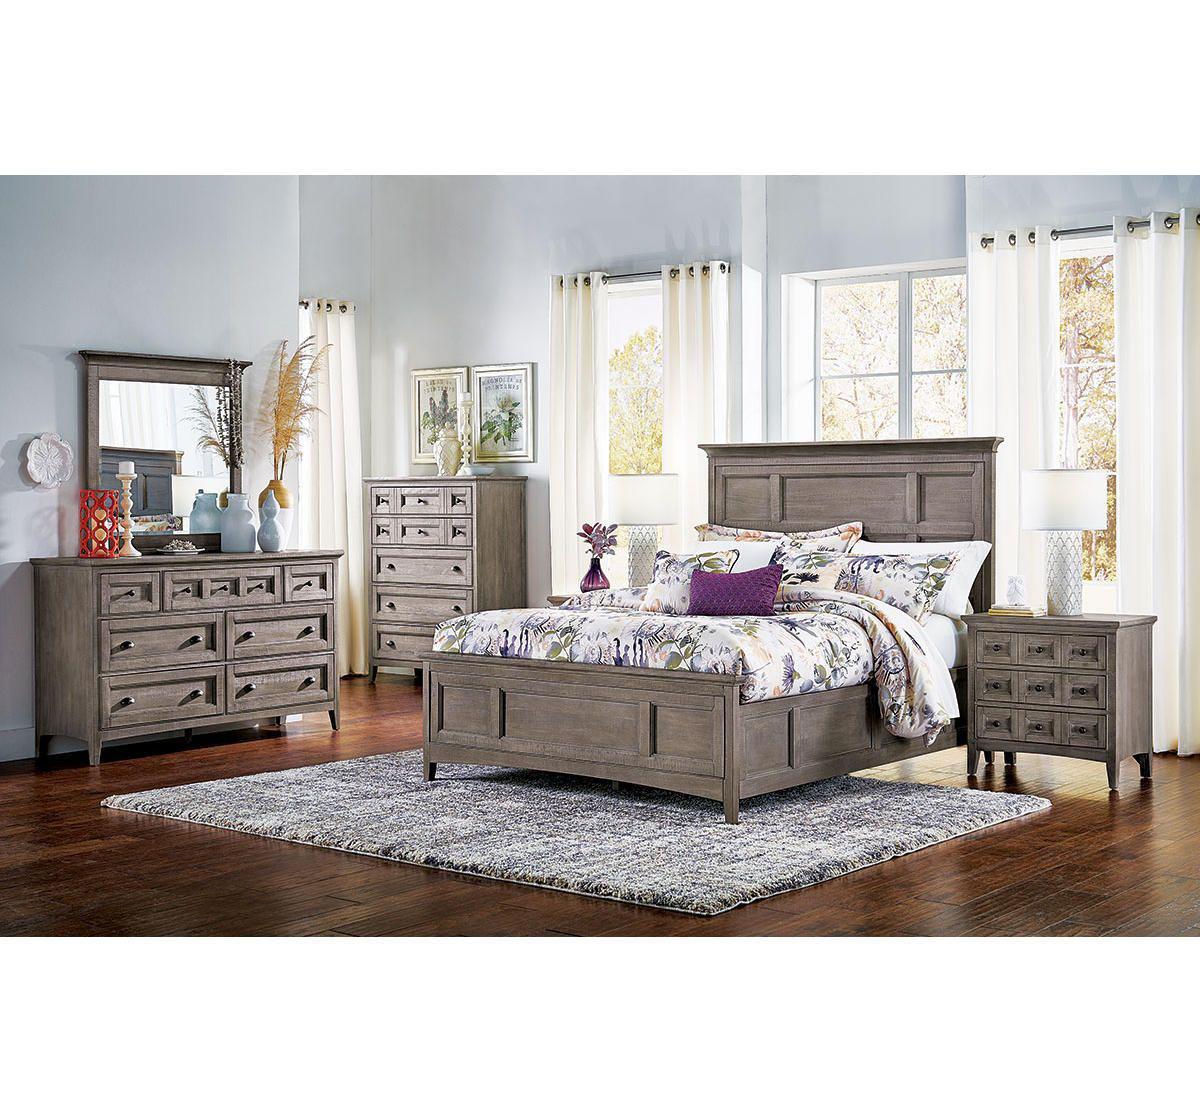 Keaton 5 Pc Bedroom Group Badcock Home Furniture More